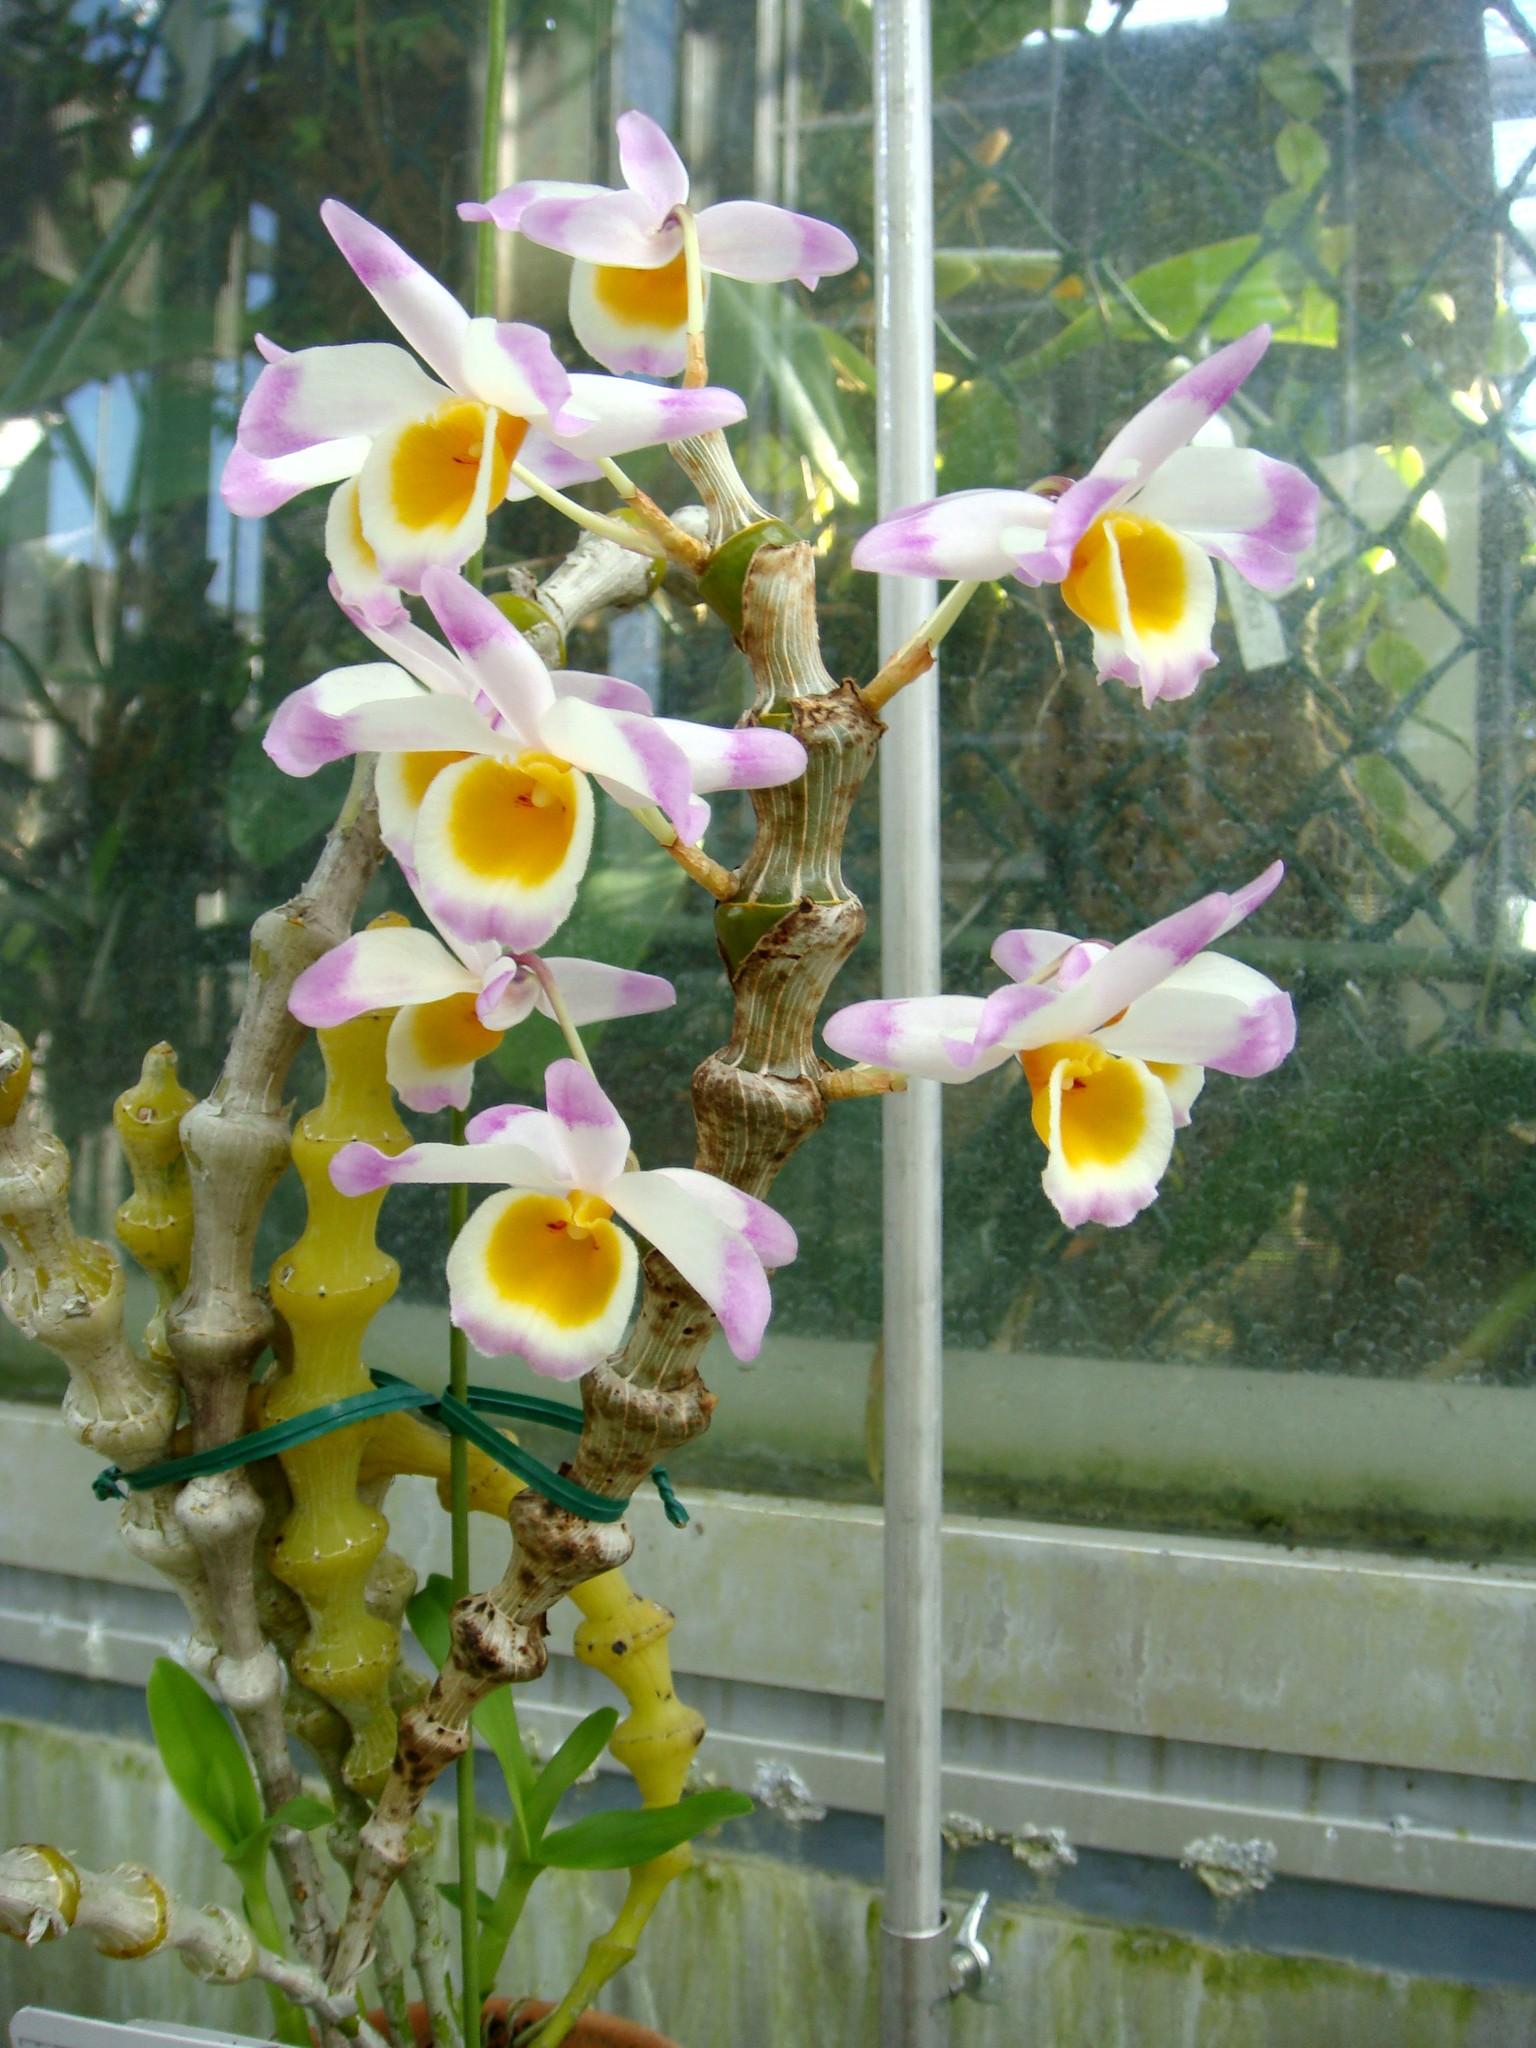 http://orchids.la.coocan.jp/Dendrobium/Dendrobium%20pendulum/DSC01842.JPG